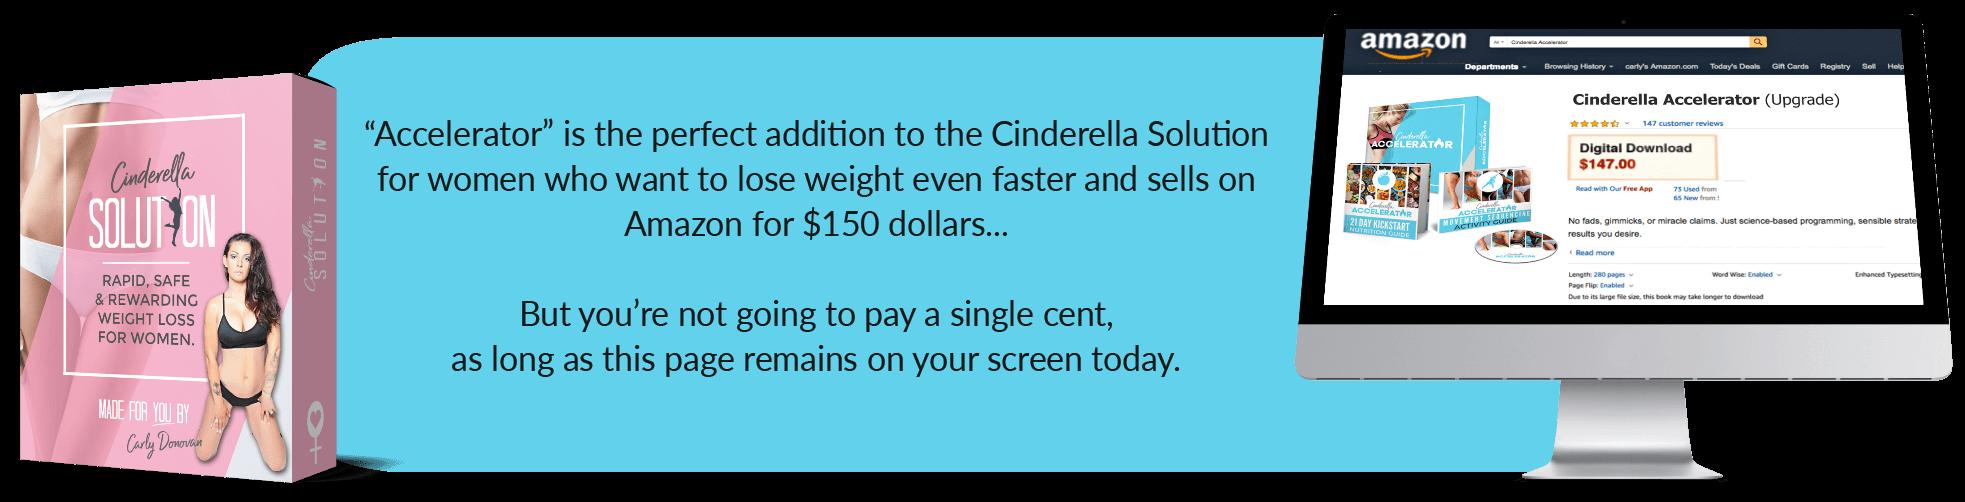 amazonthing - Cinderella Solution